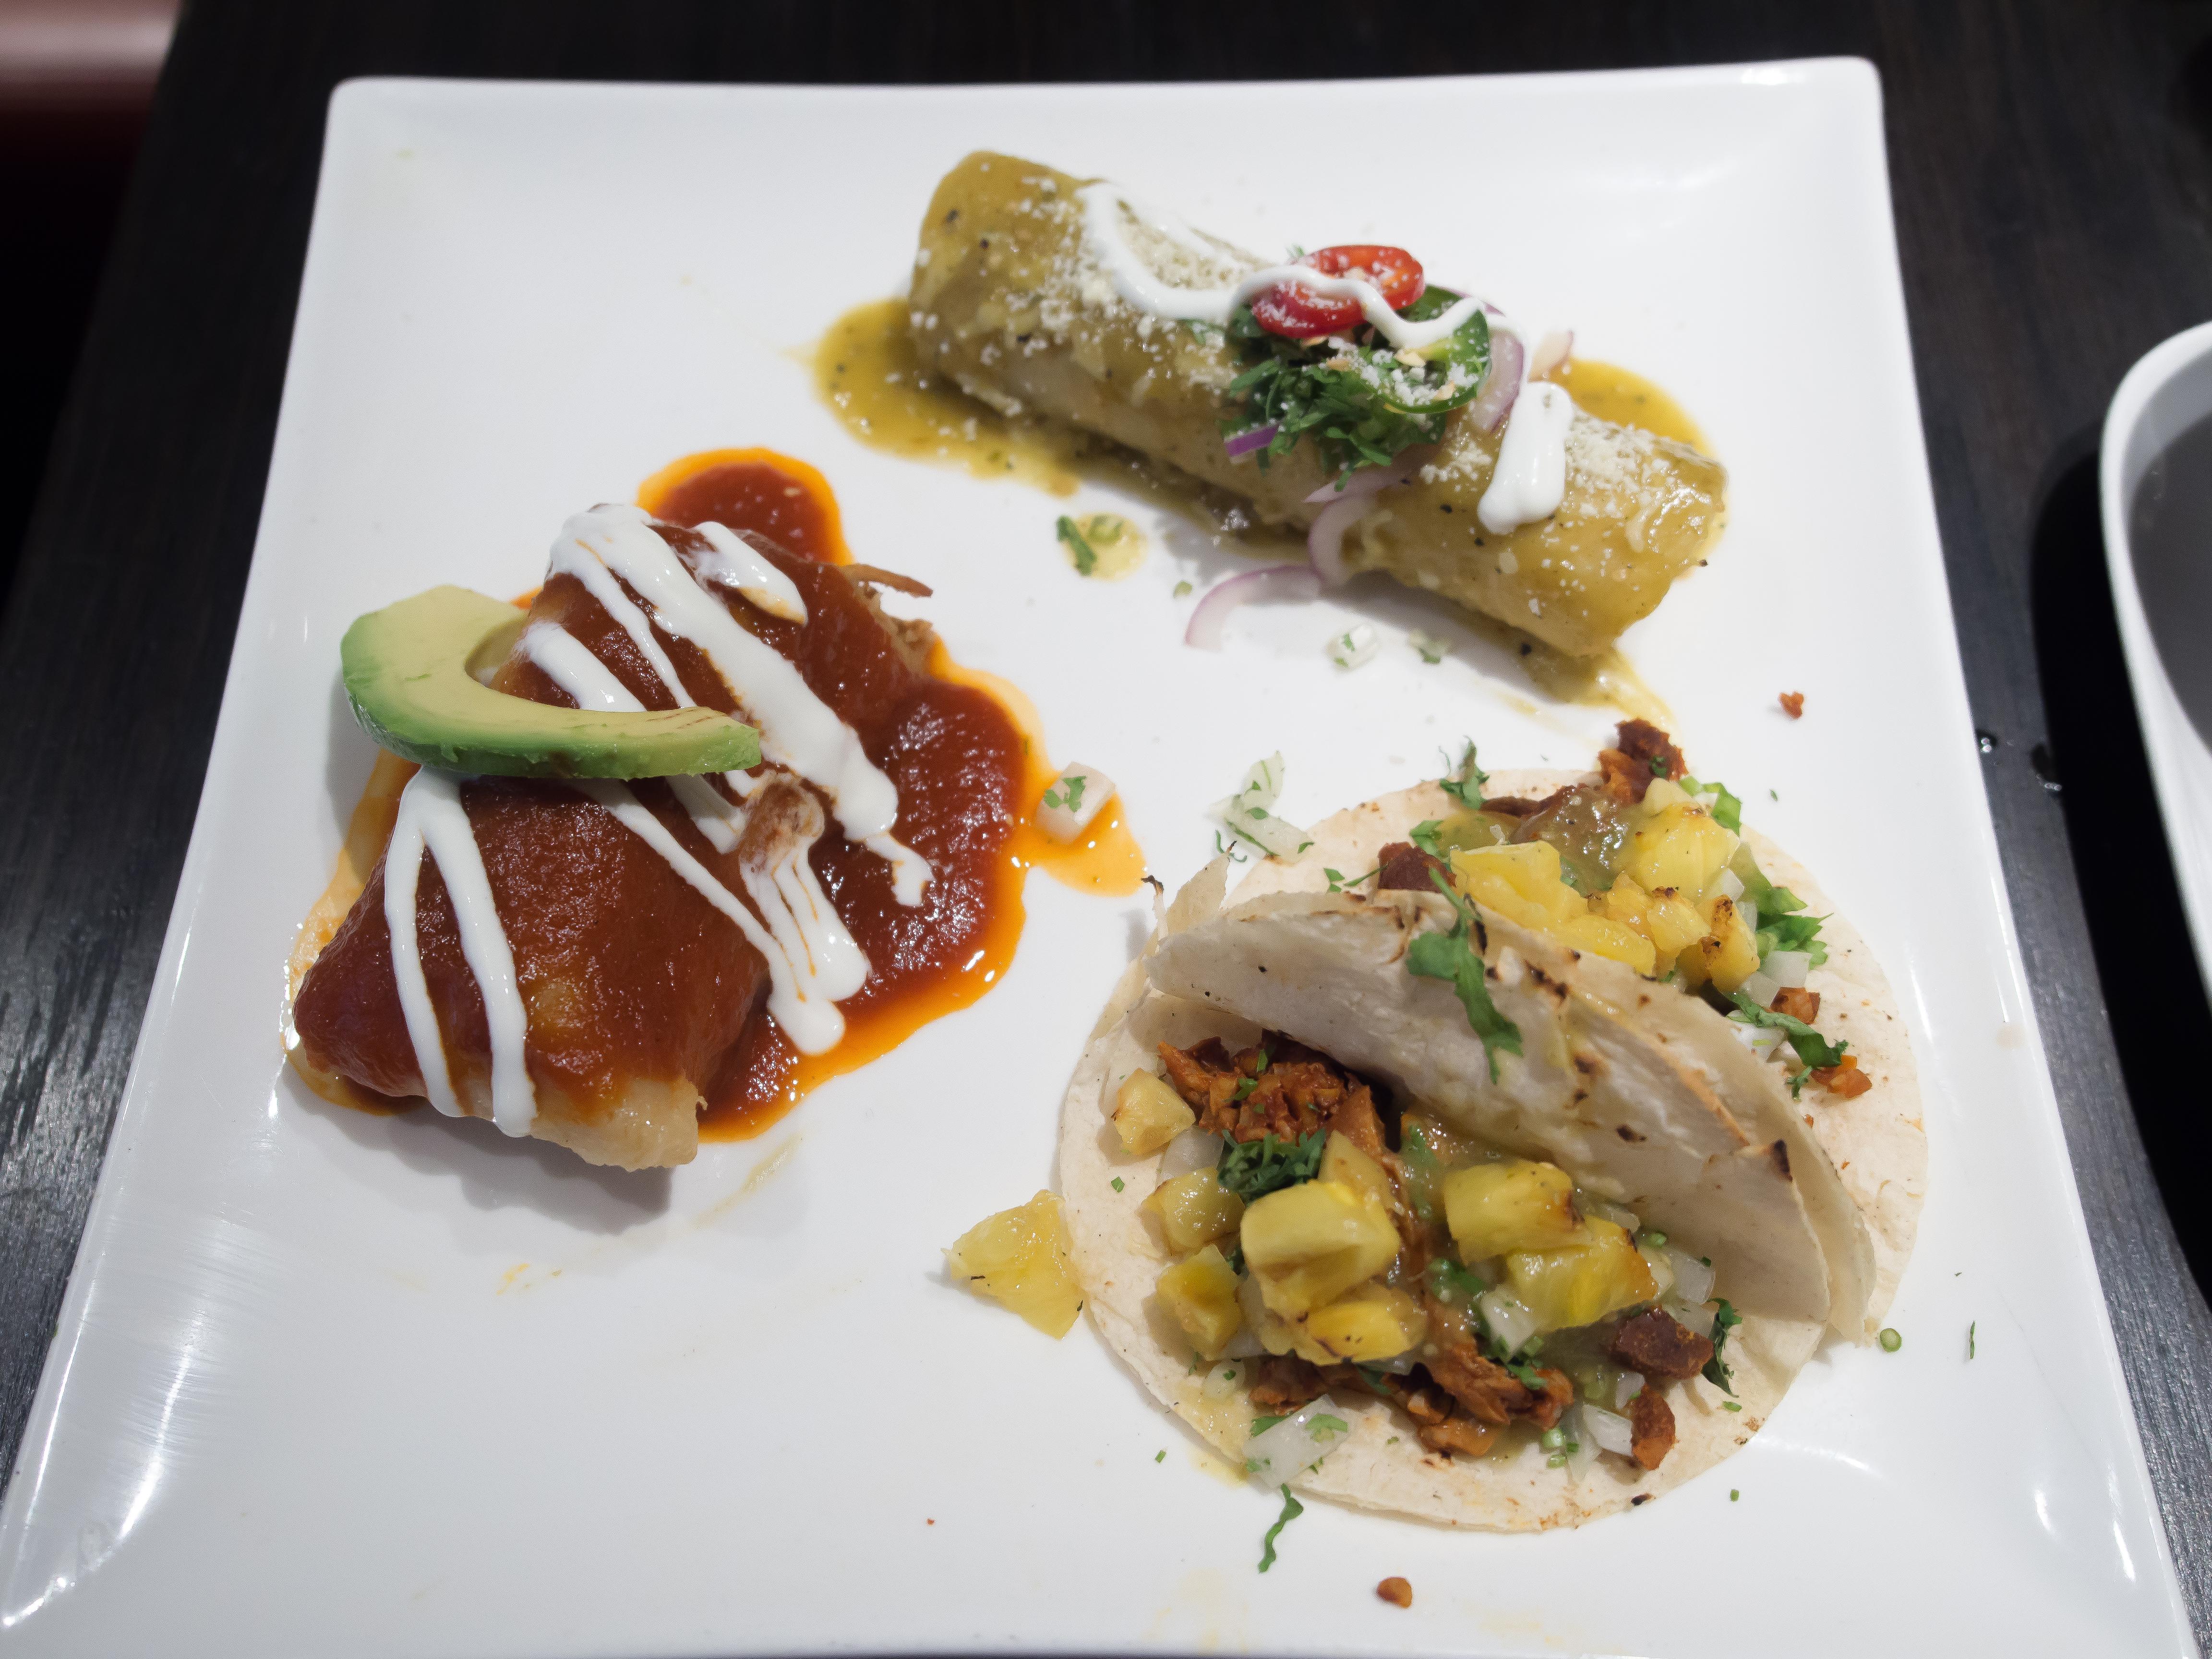 Plato Maya Chicken Tinga Tamal, Chicken Enchilada, Taco al Pastor